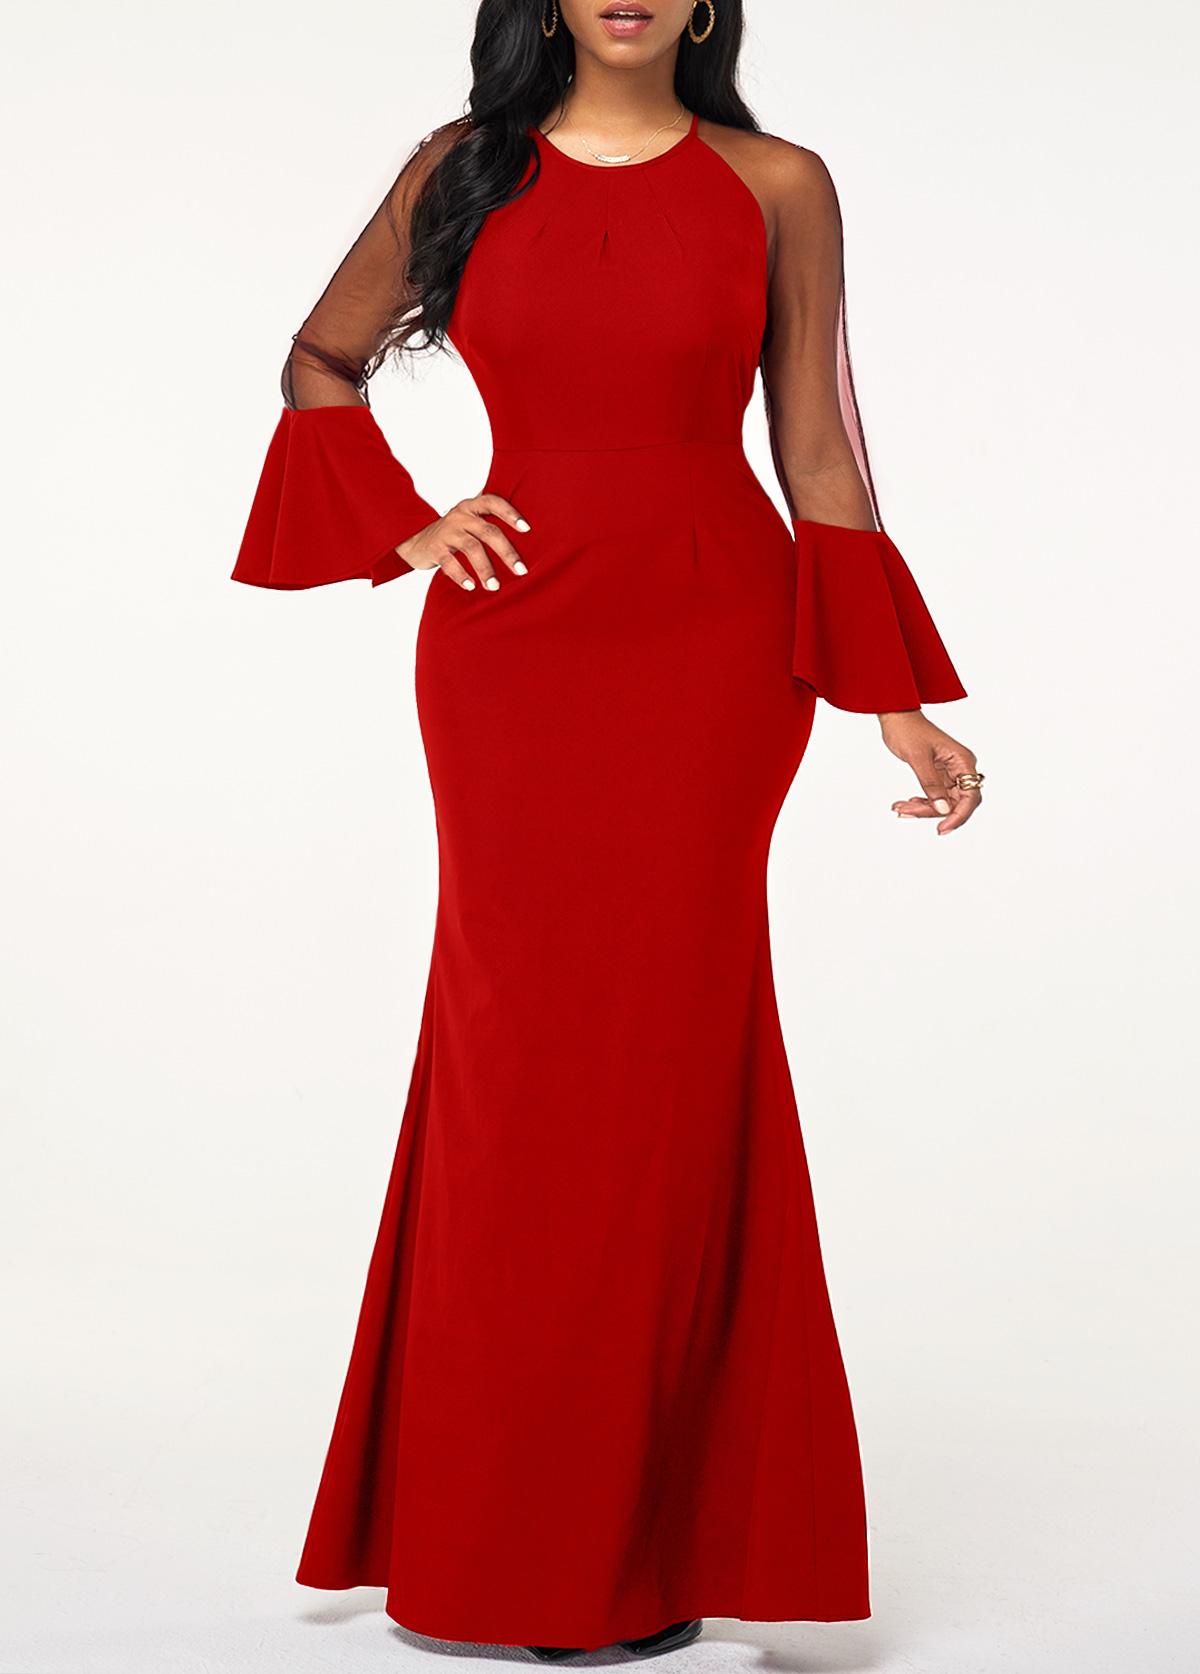 Flare Cuff Mesh Panel Red Maxi Dress